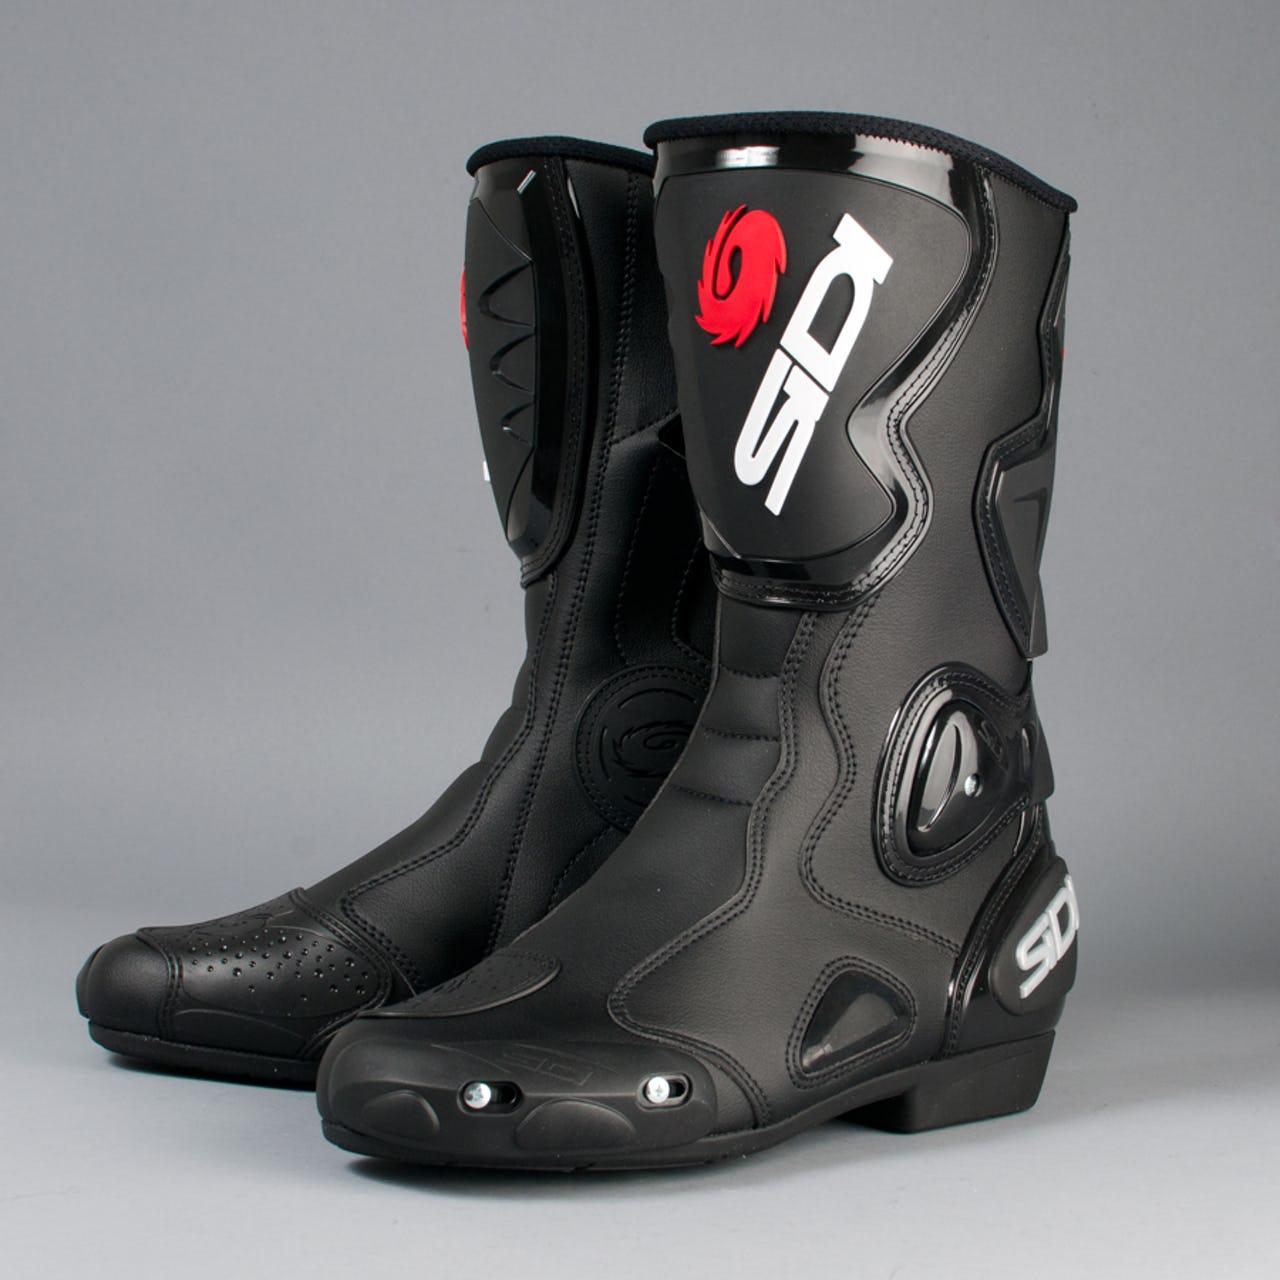 Bottes de moto Sidi B2 - Noir